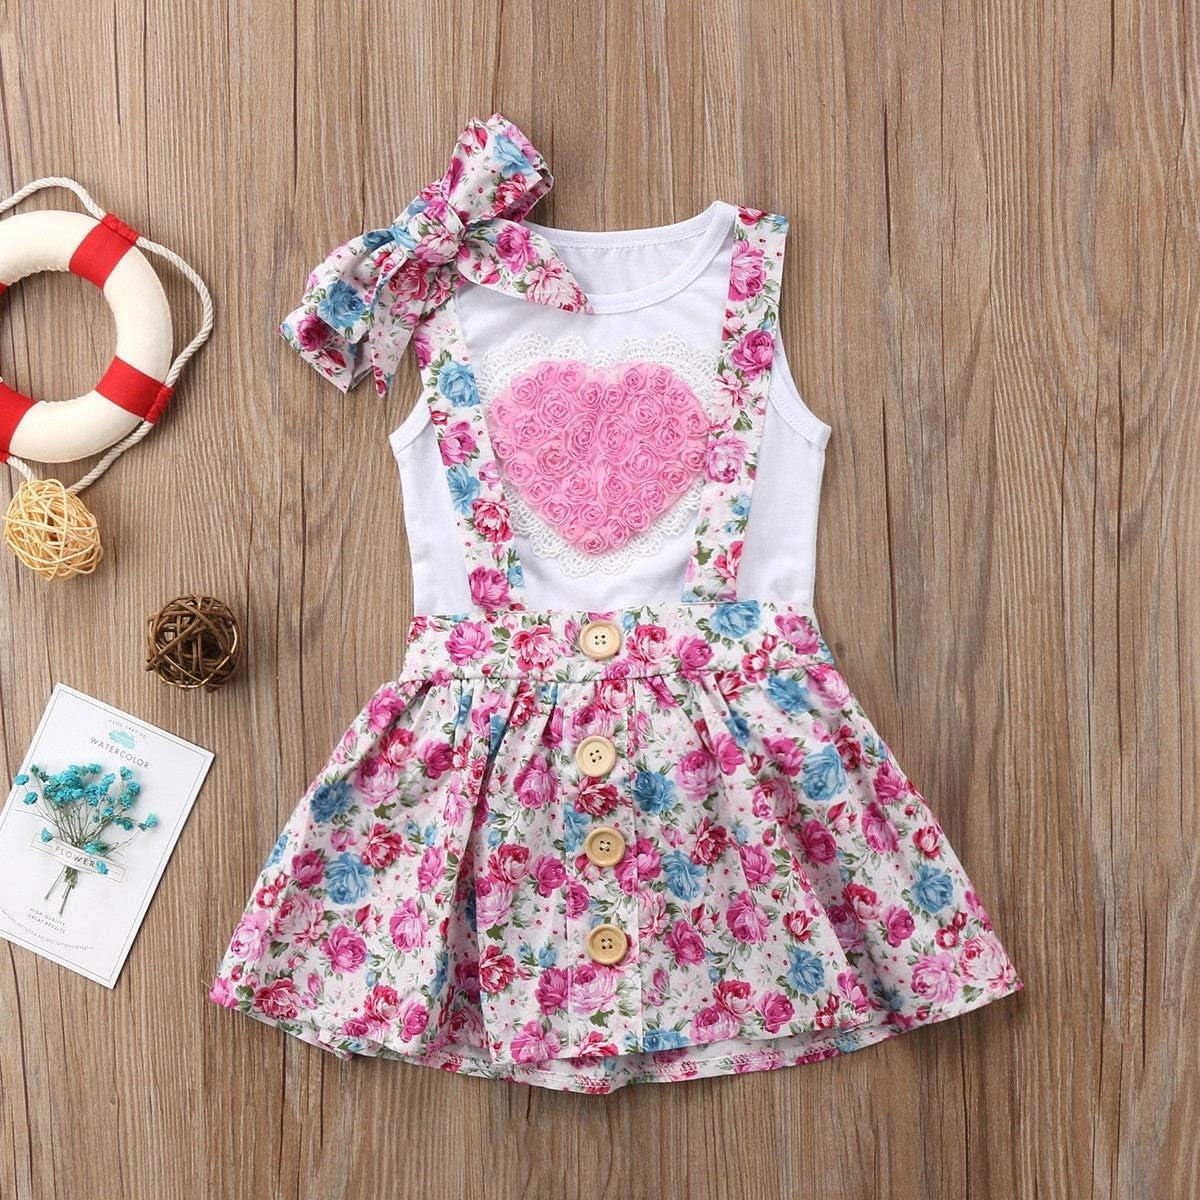 Puseky 3 st/ücke baby m/ädchen schwester passenden herz weste stirnband floral strapsrock sommer outfits Color : White+Pink, Size : Big Sister-3Y-4Y